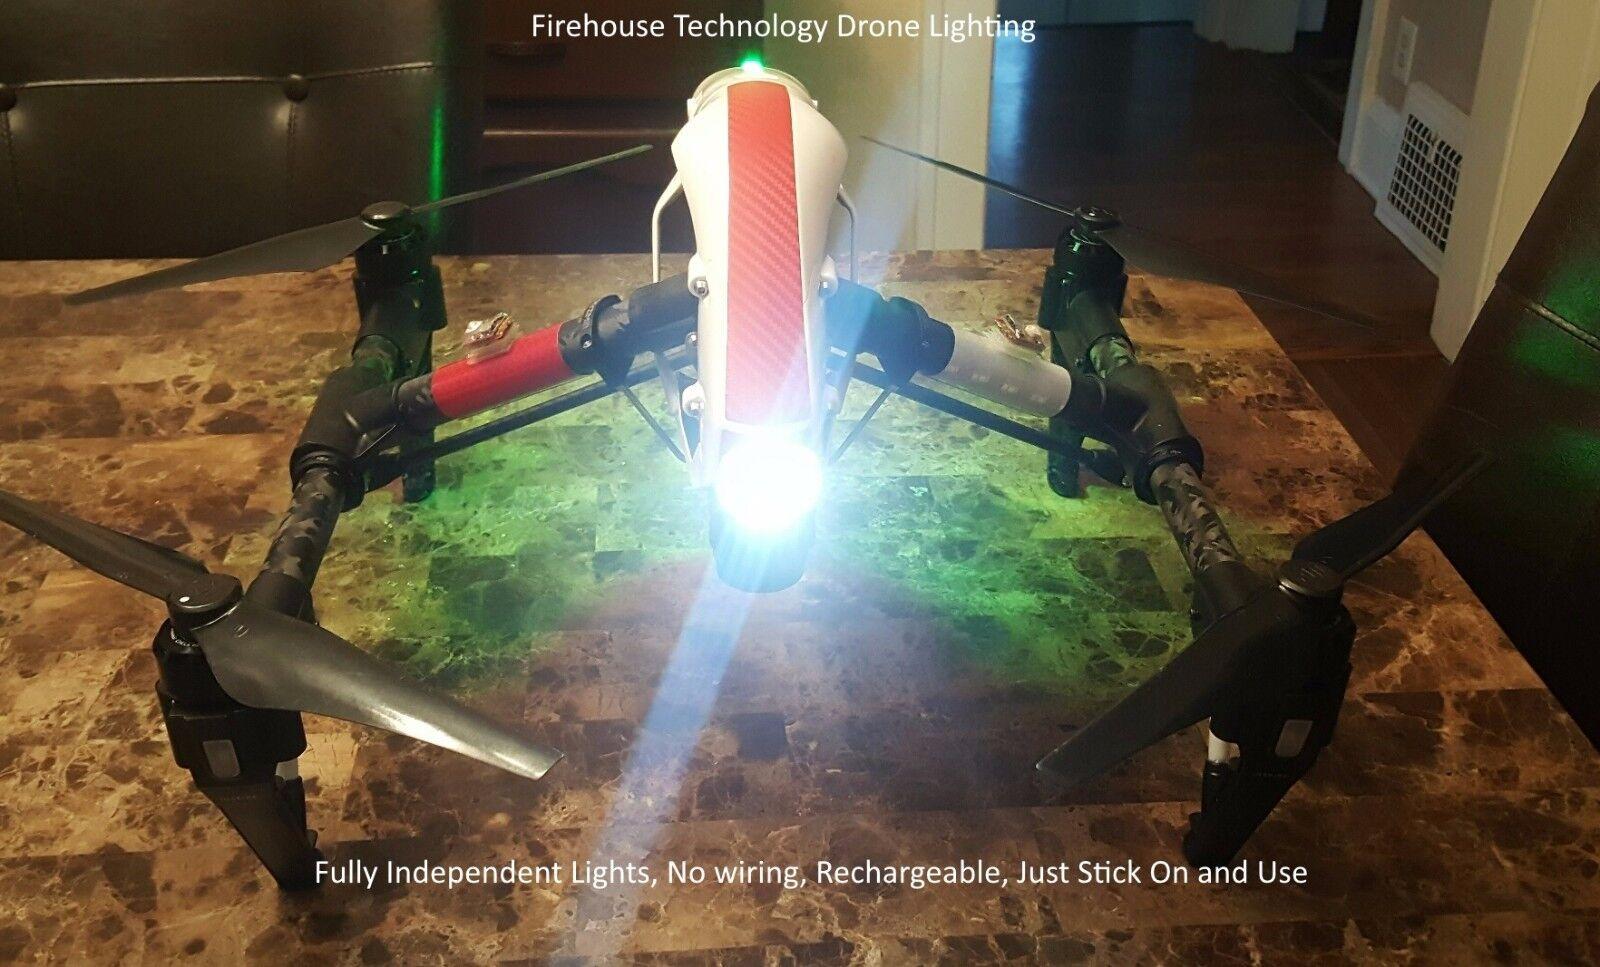 DRONE DUAL CREE STROBE LIGHT NAVIGATION KIT DJI INSPIRE 1 2 PHANTOM MAVIC